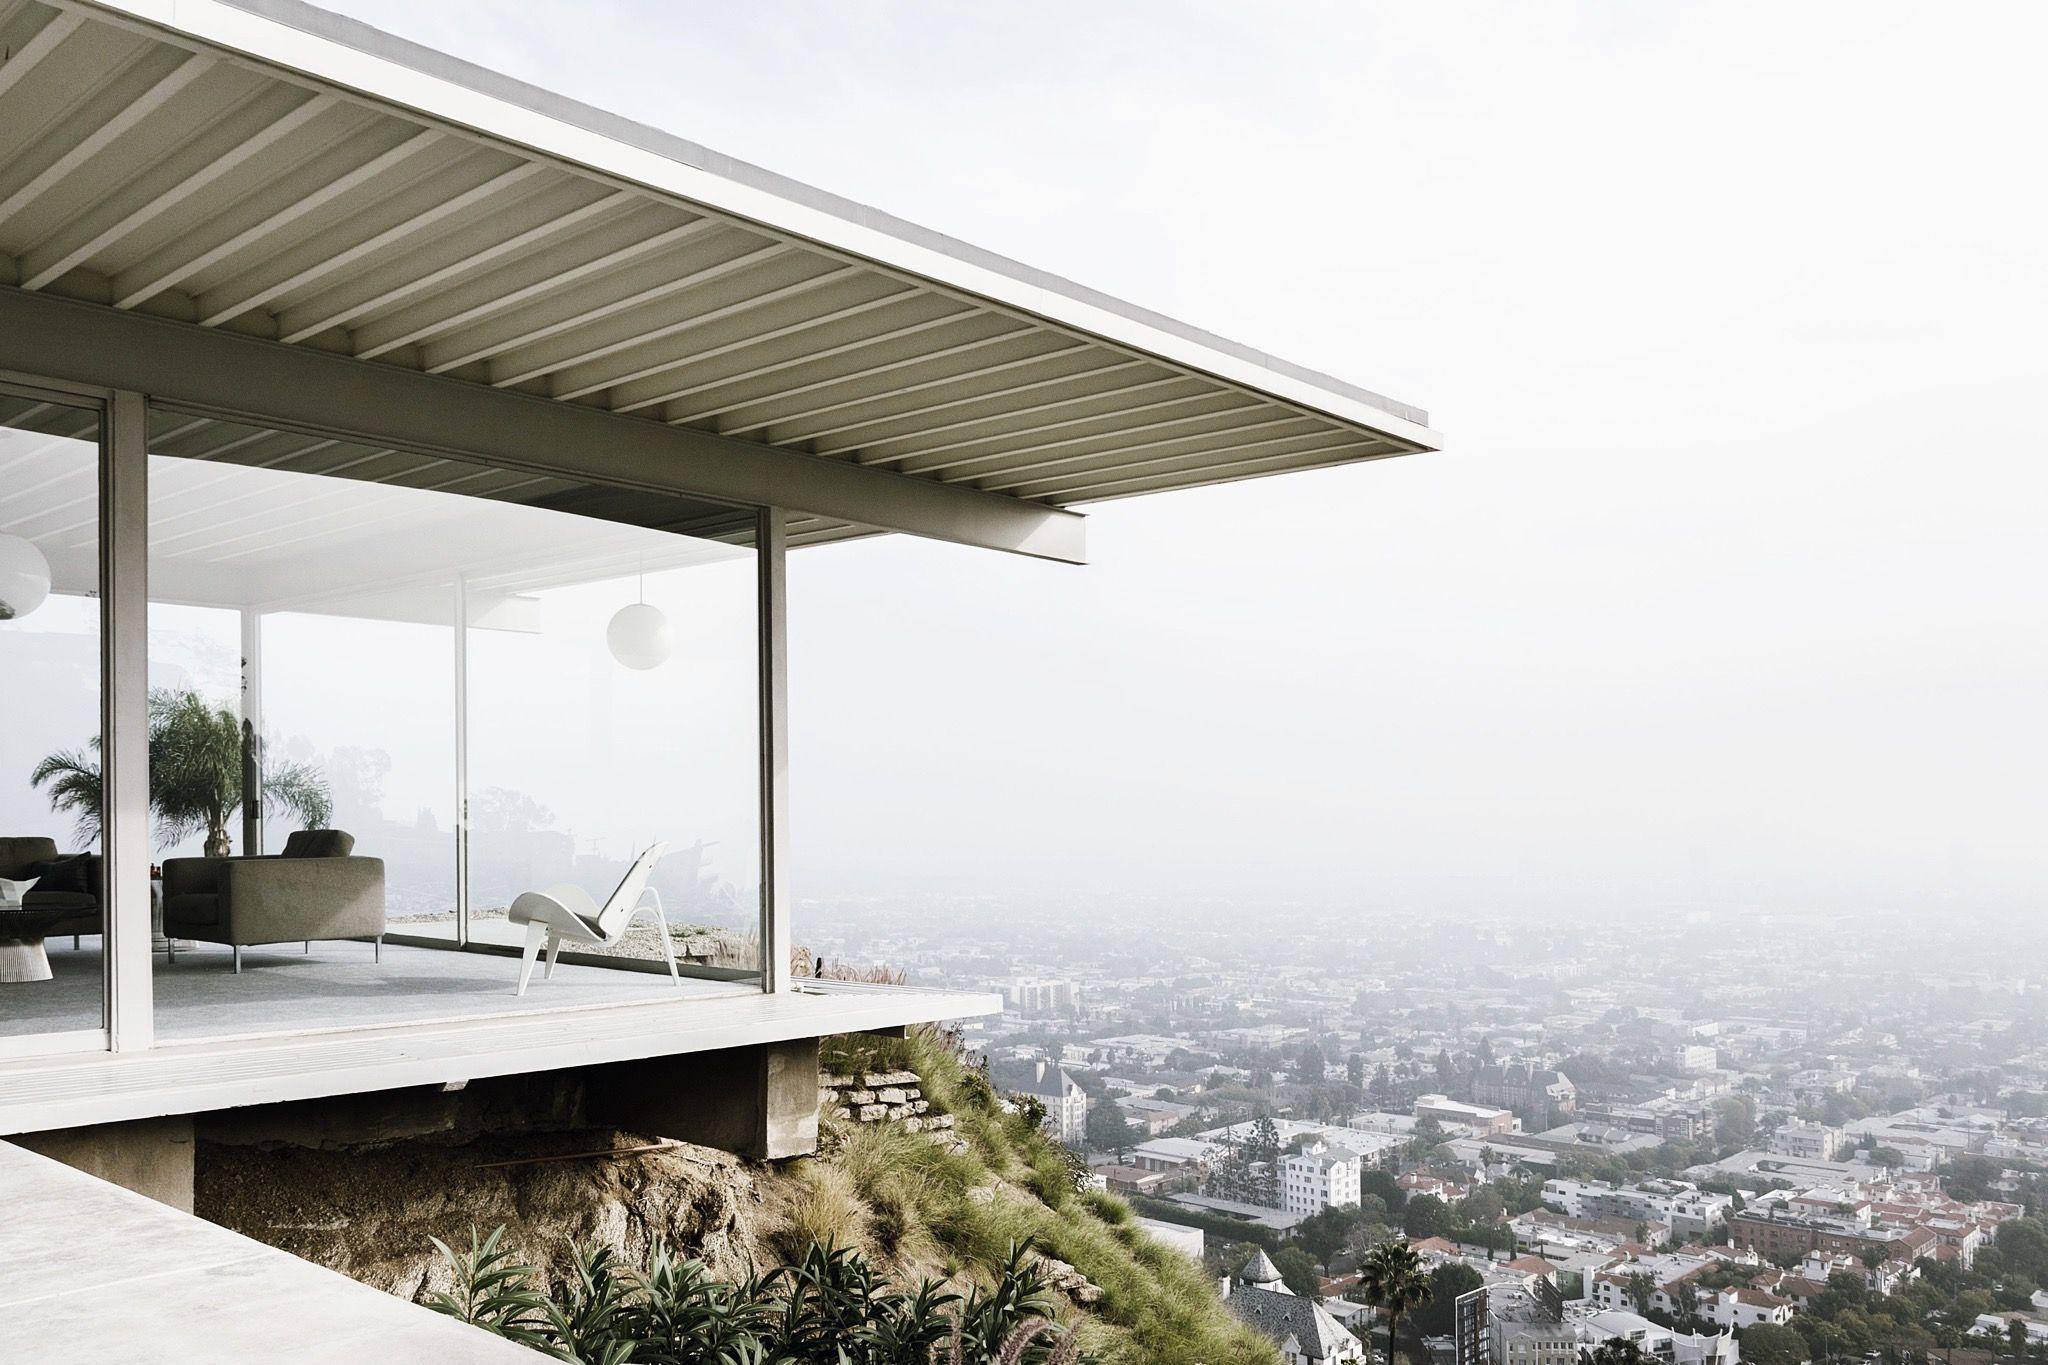 February 6 2013 8 50 Am Jamesguerrisi Vsco Grid Case Study Houses Architecture Building Design Glass House